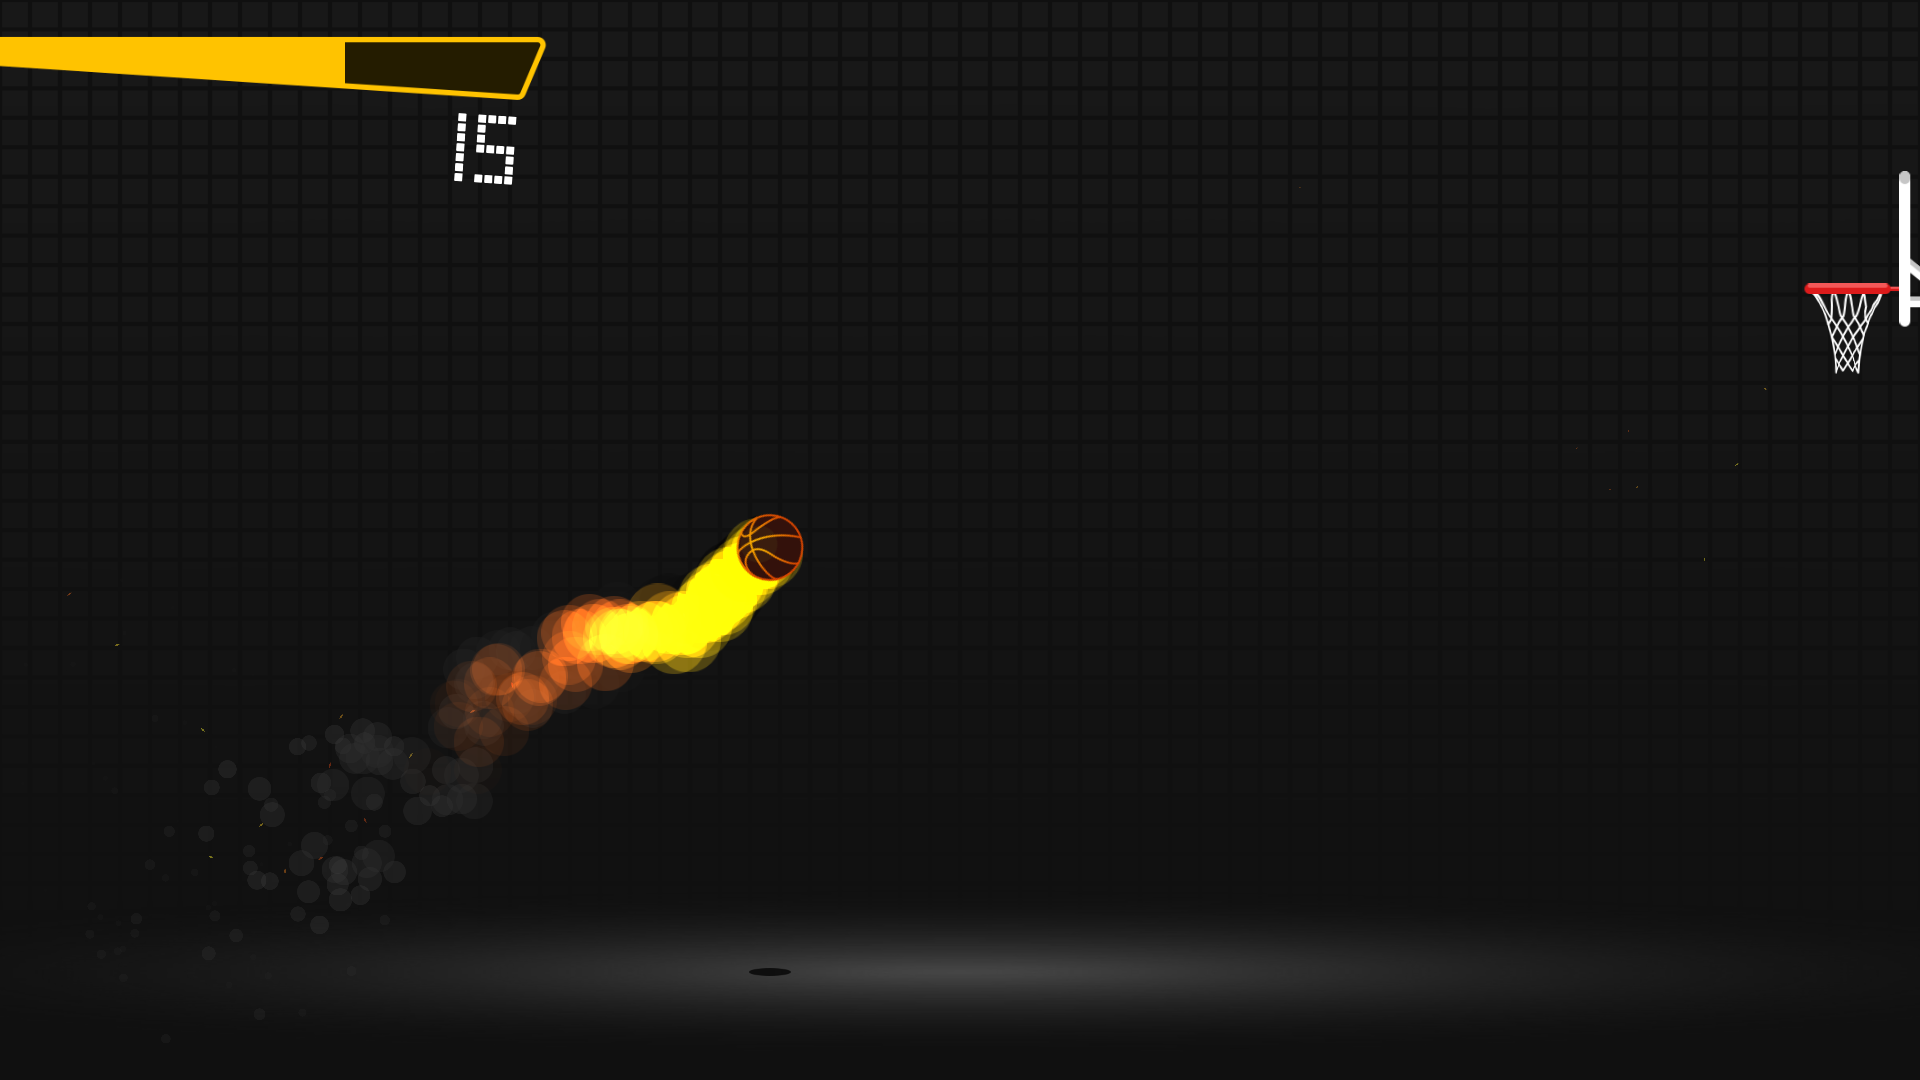 Dunkz - Basketball game screenshot 20